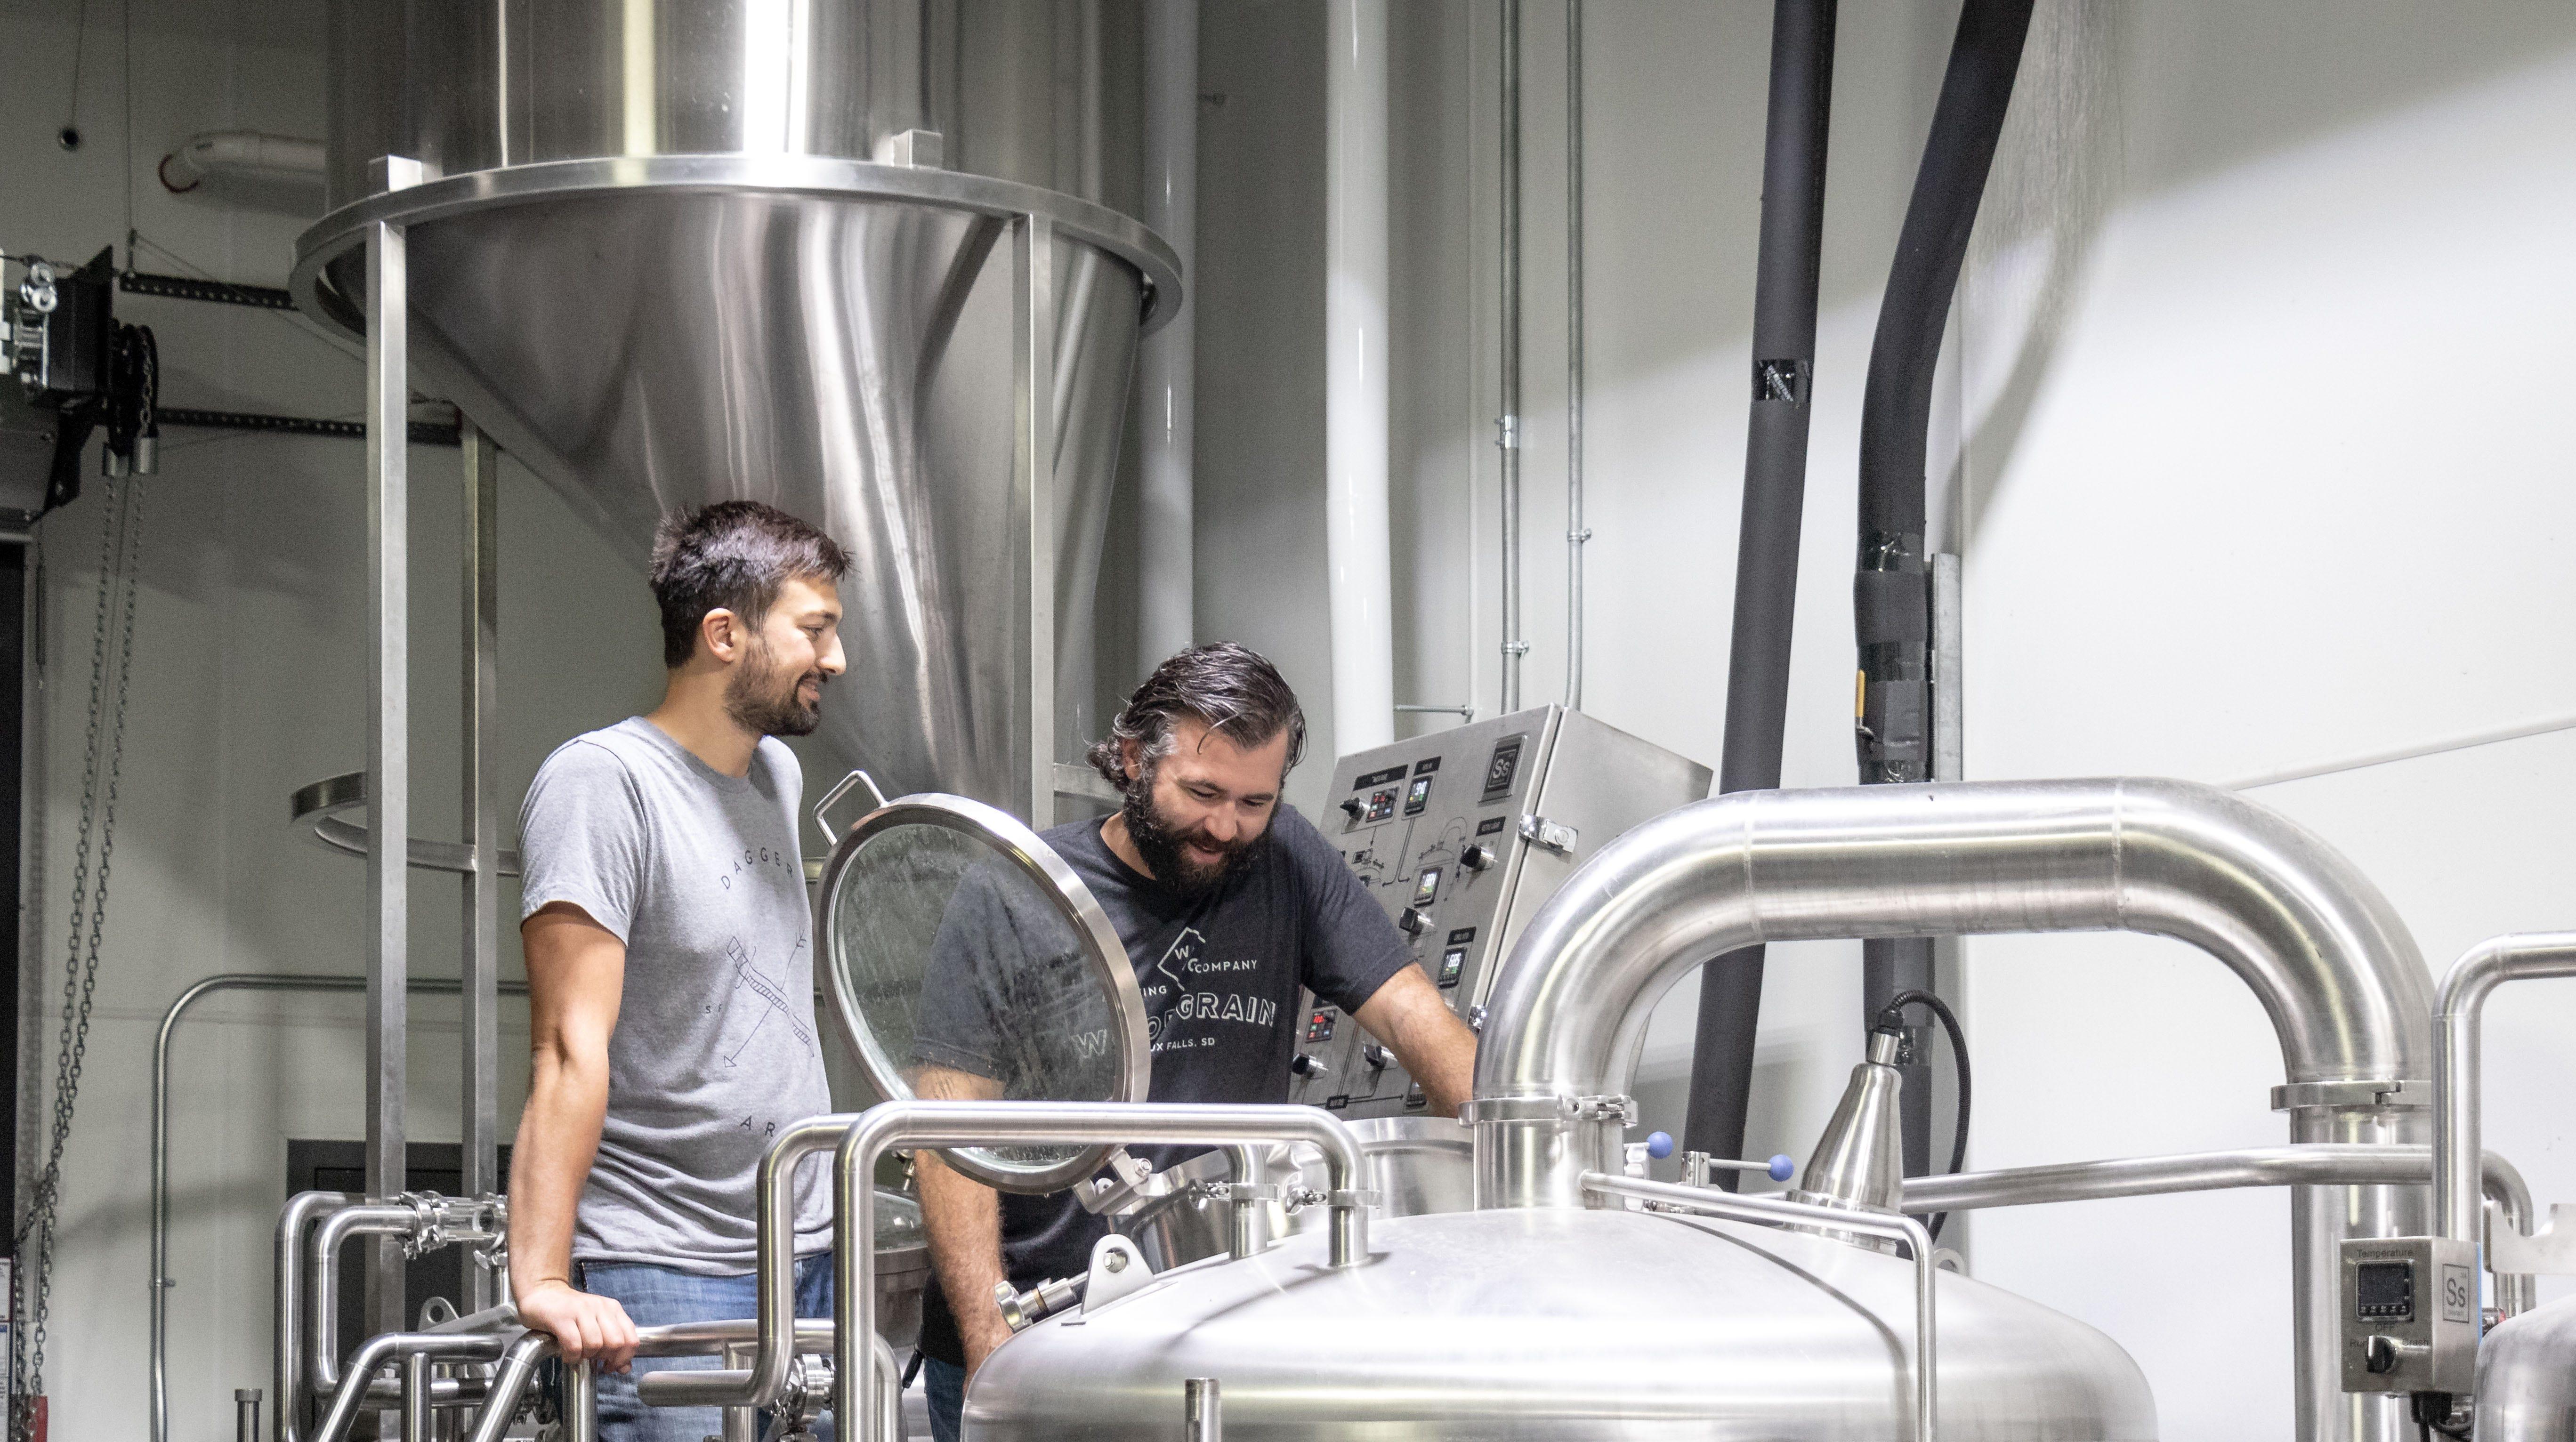 WoodGrain, Fernson teaming up on new beer